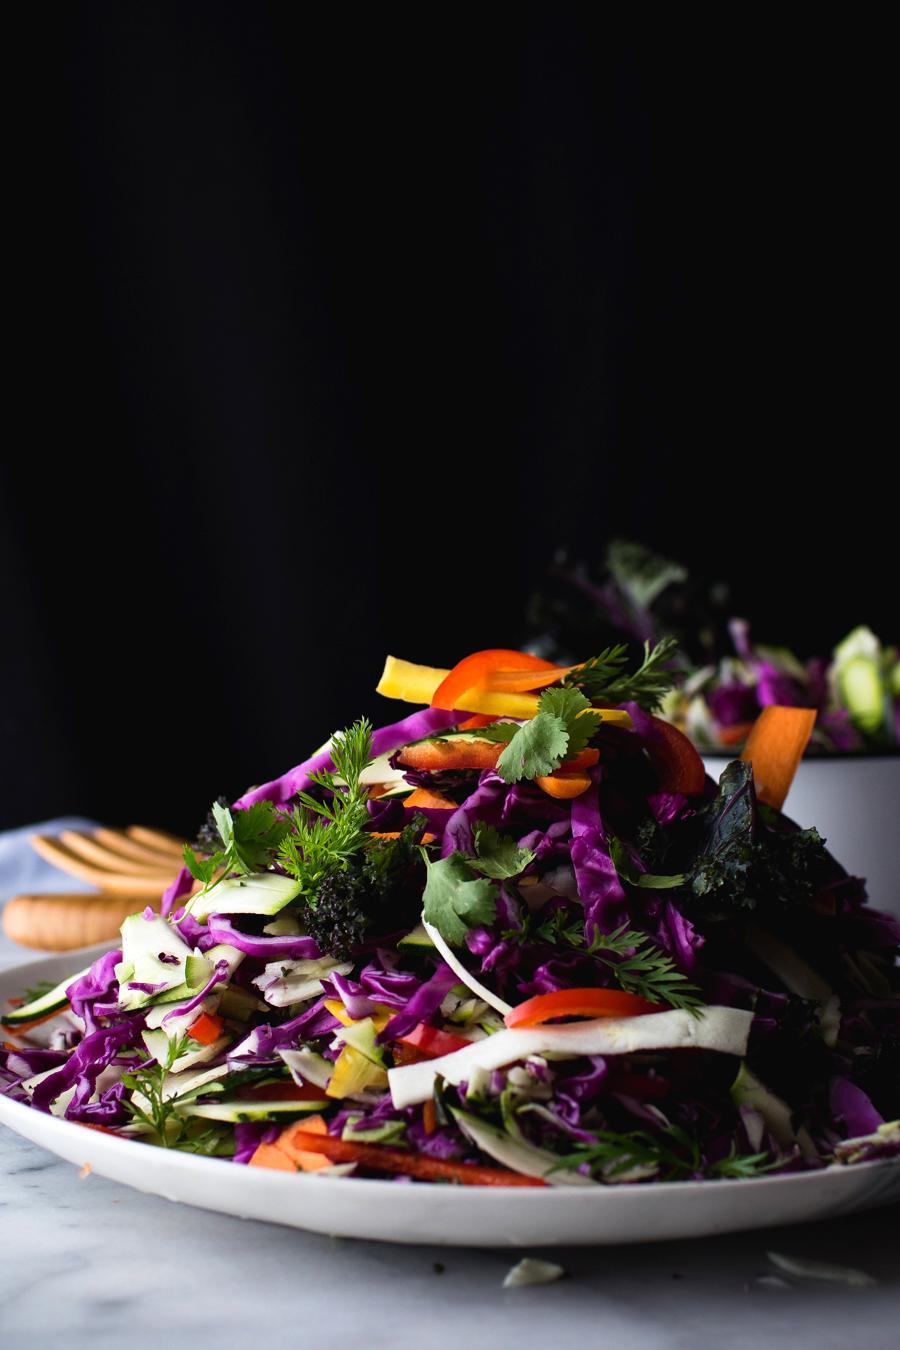 VegetarianVenturesThaiSaladSM (16 of 51) copy